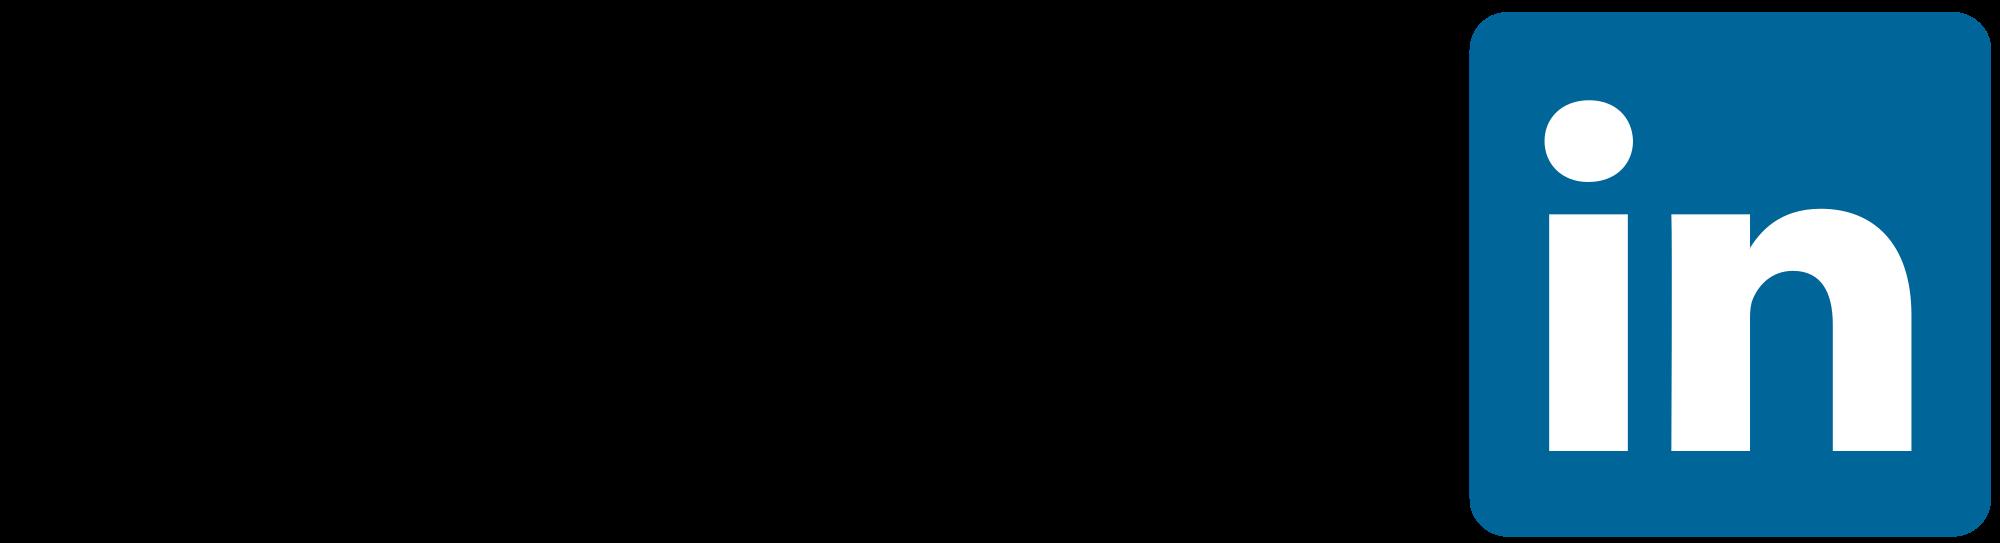 ViaTRON Document Scanning